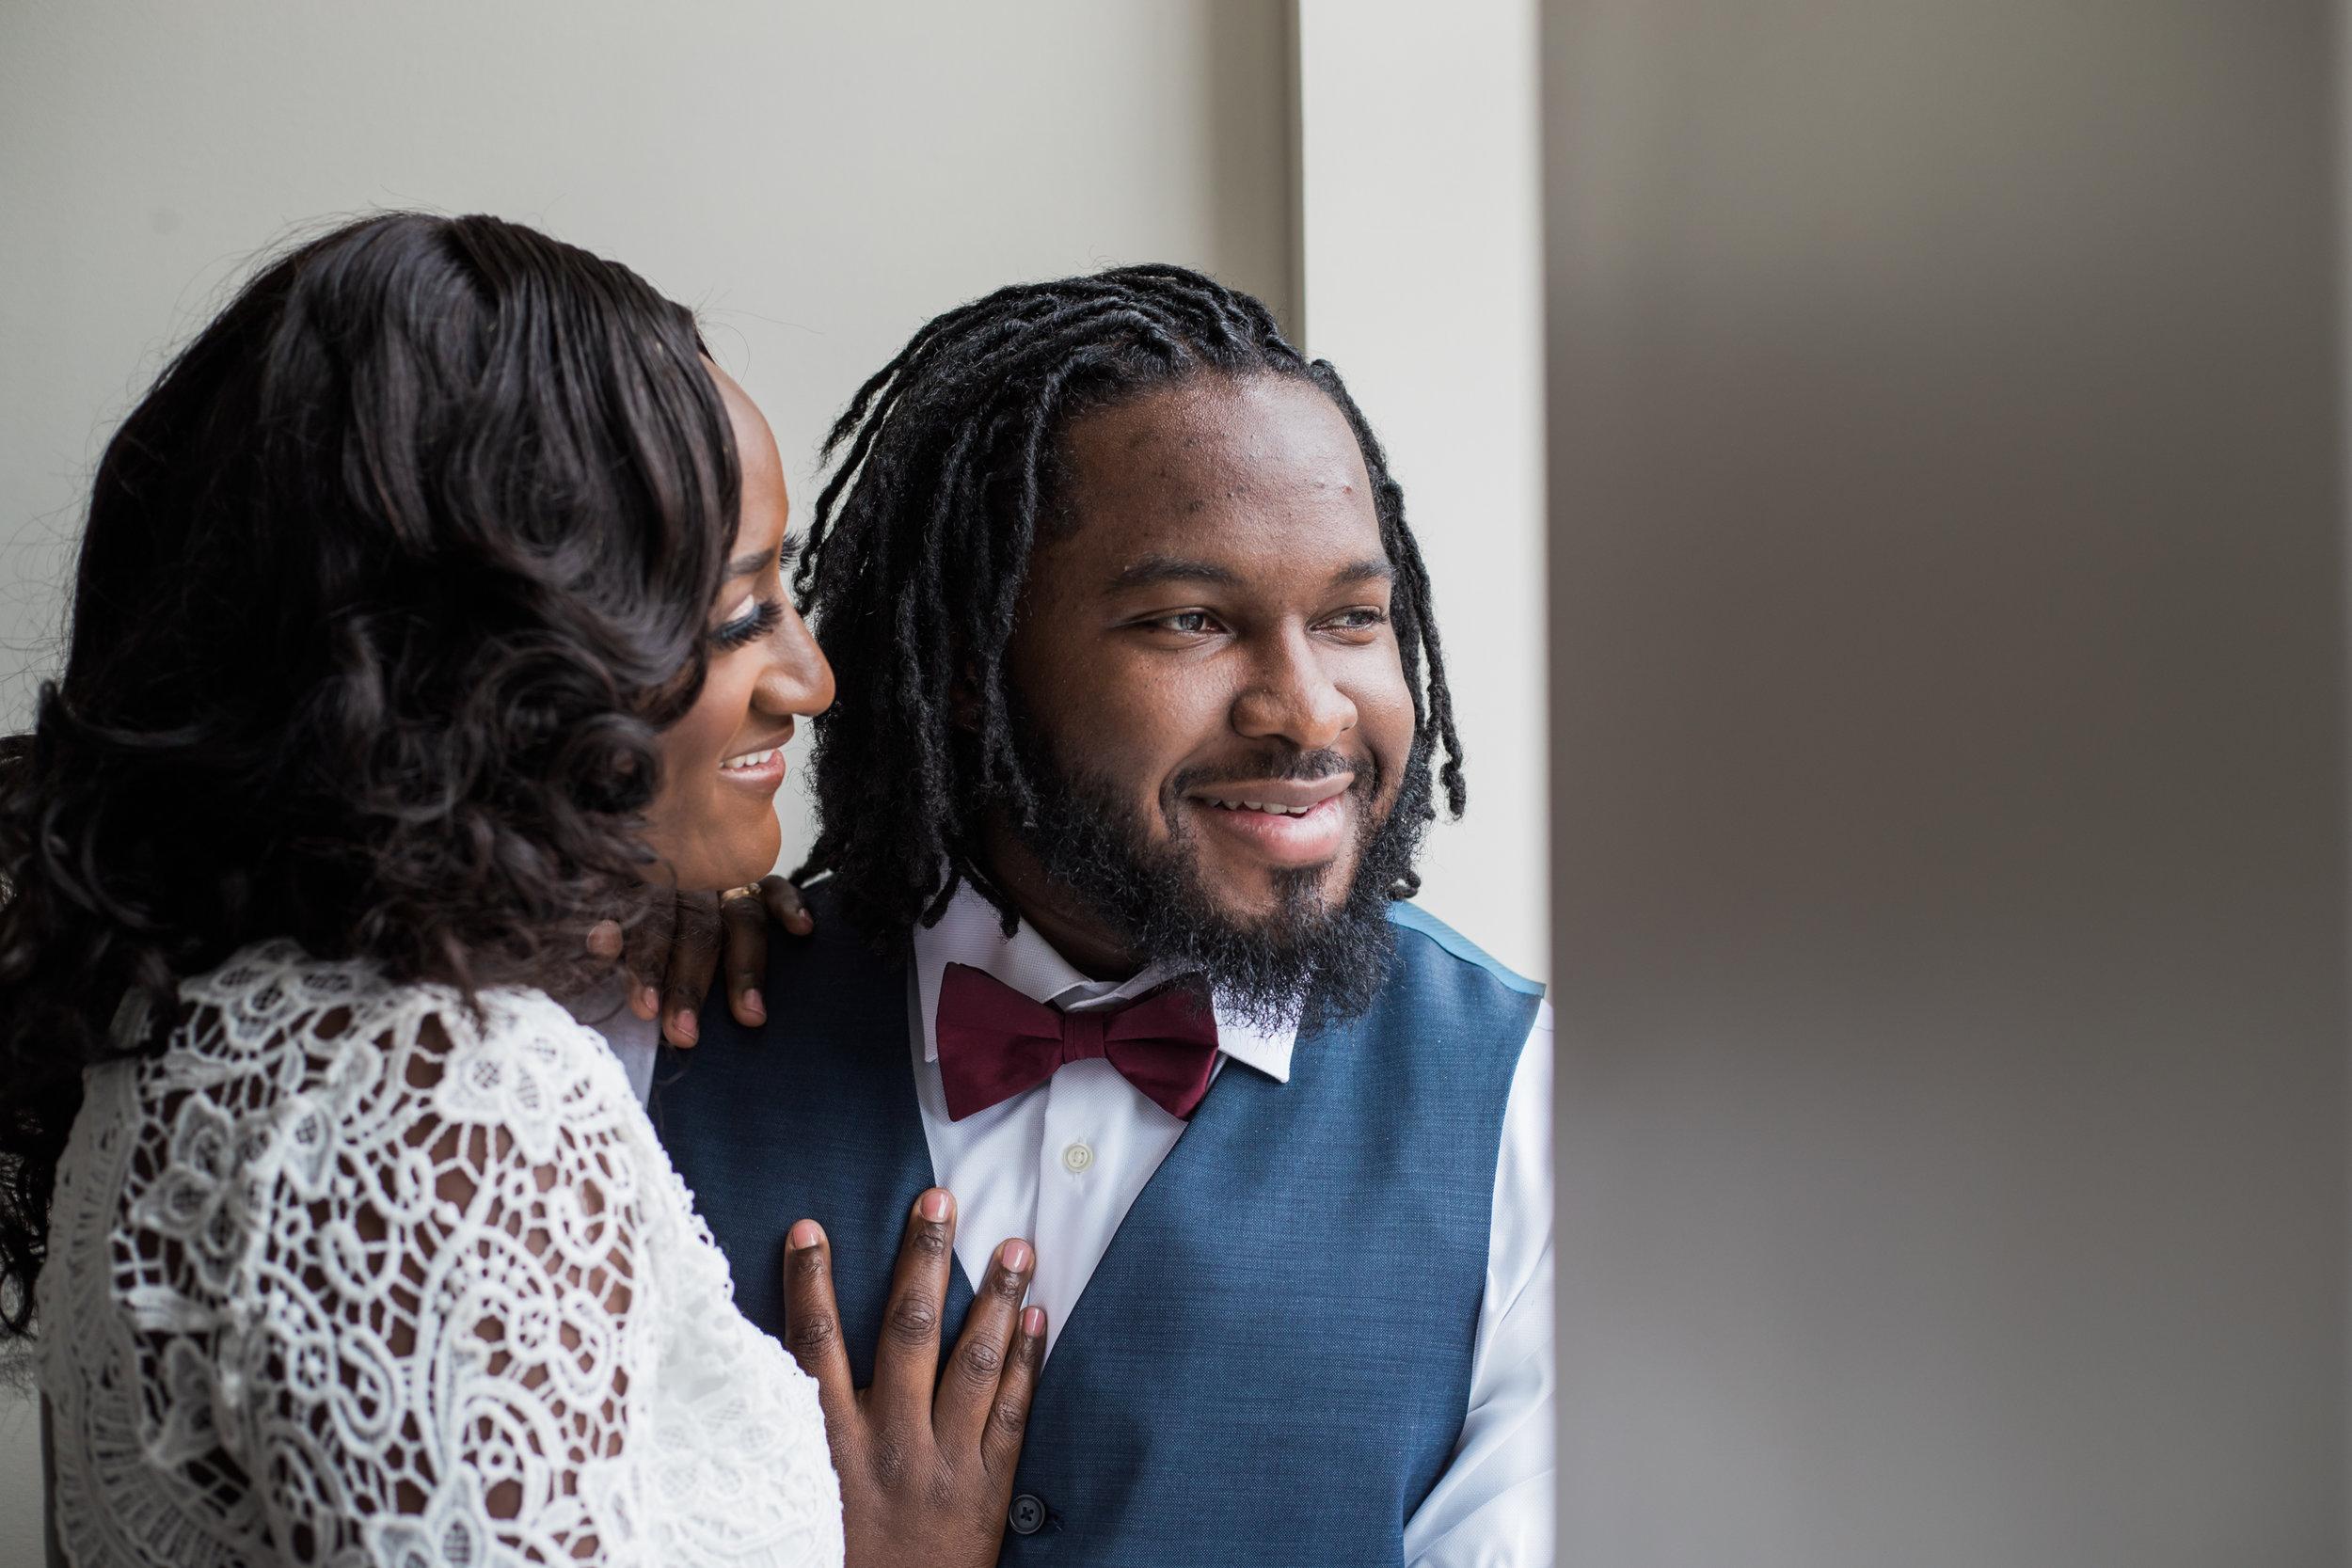 Baltimore City Wedding at Hotel Indigo Megapixels Media Photography Tira Lynn Events Black Bride and Groom (25 of 74).jpg